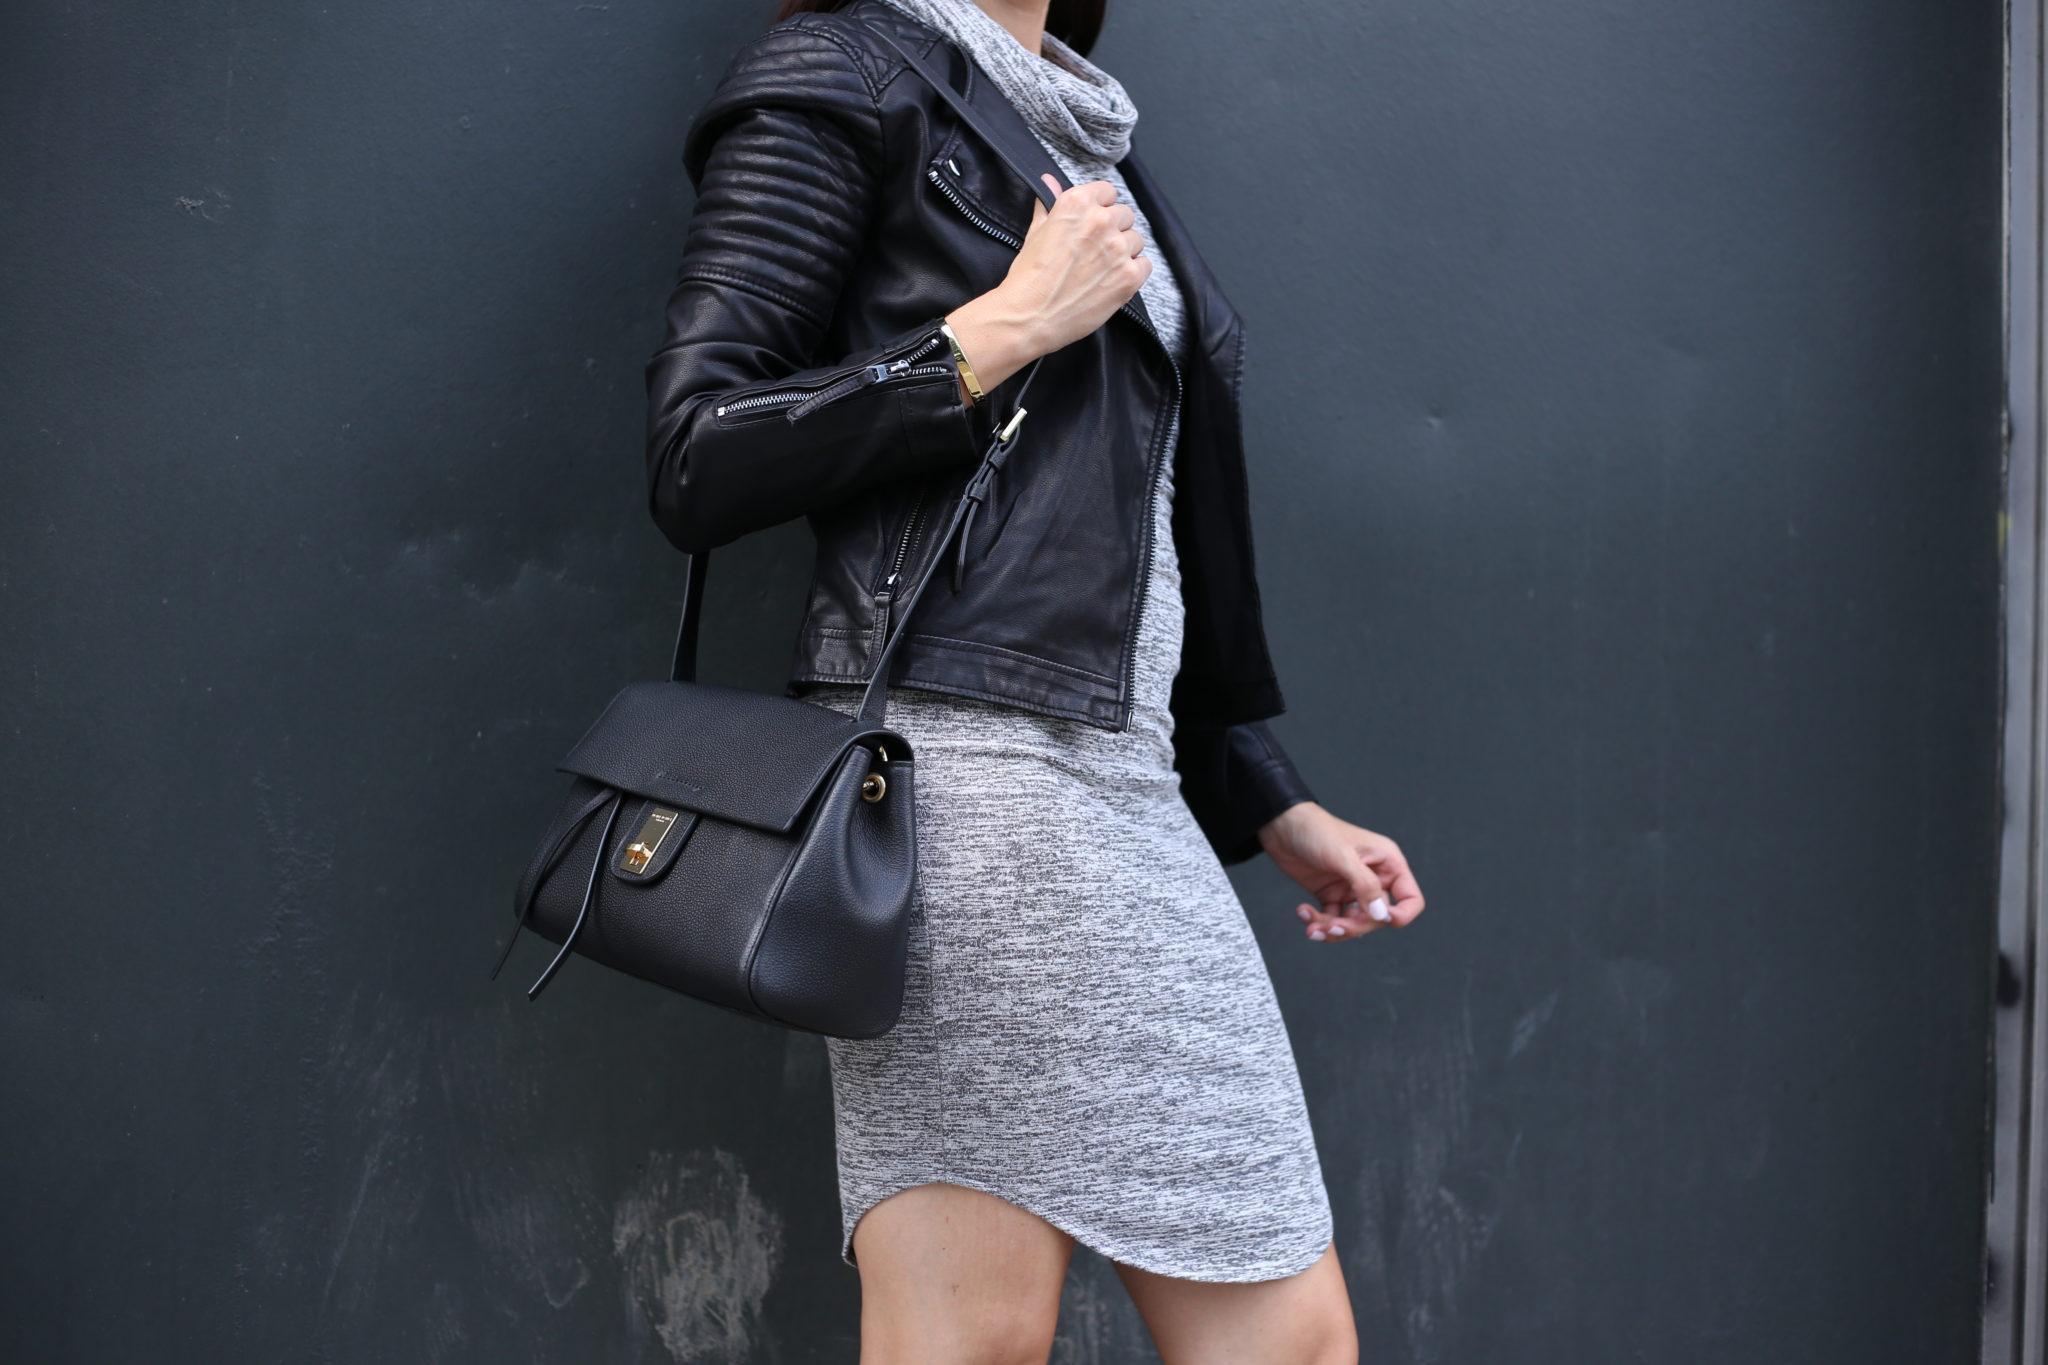 Cowl Neck Dress & Leather Moto – Favorite Fall Fashion